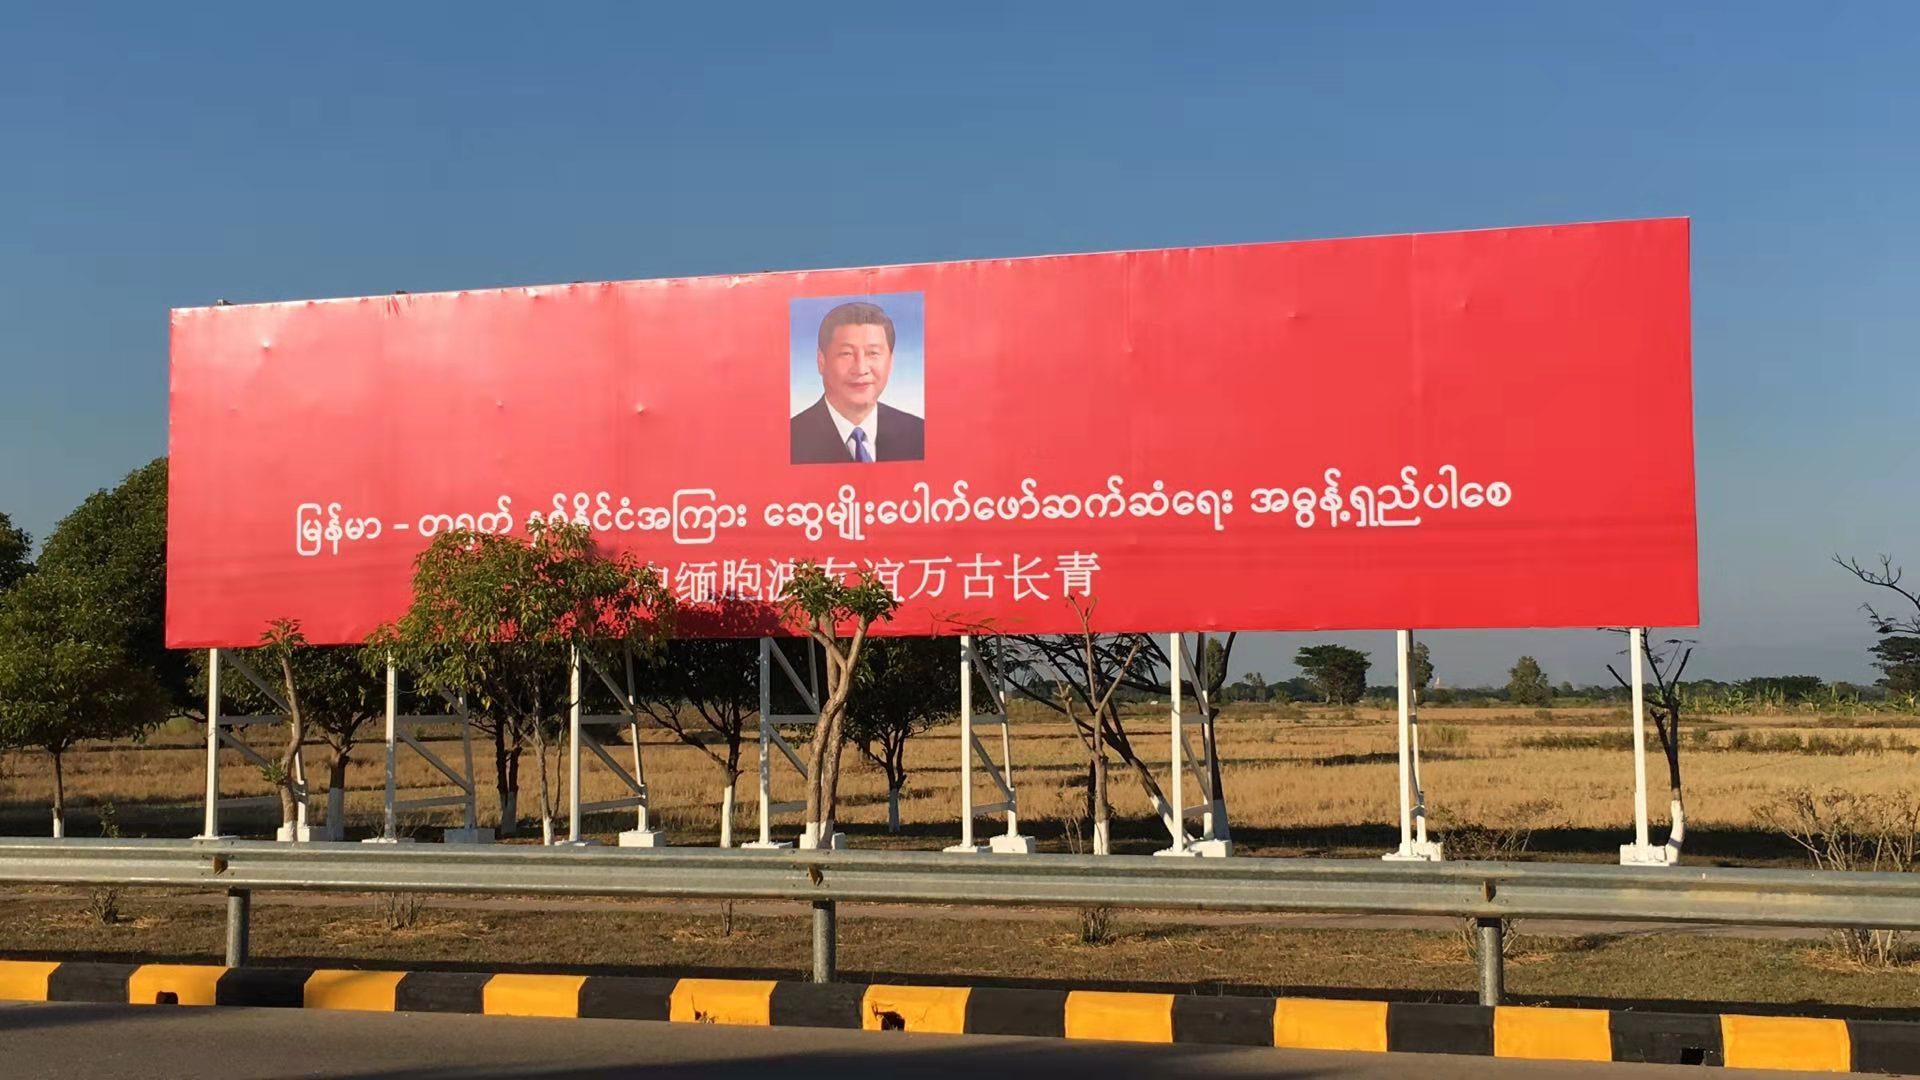 Glimpse of Myanmar